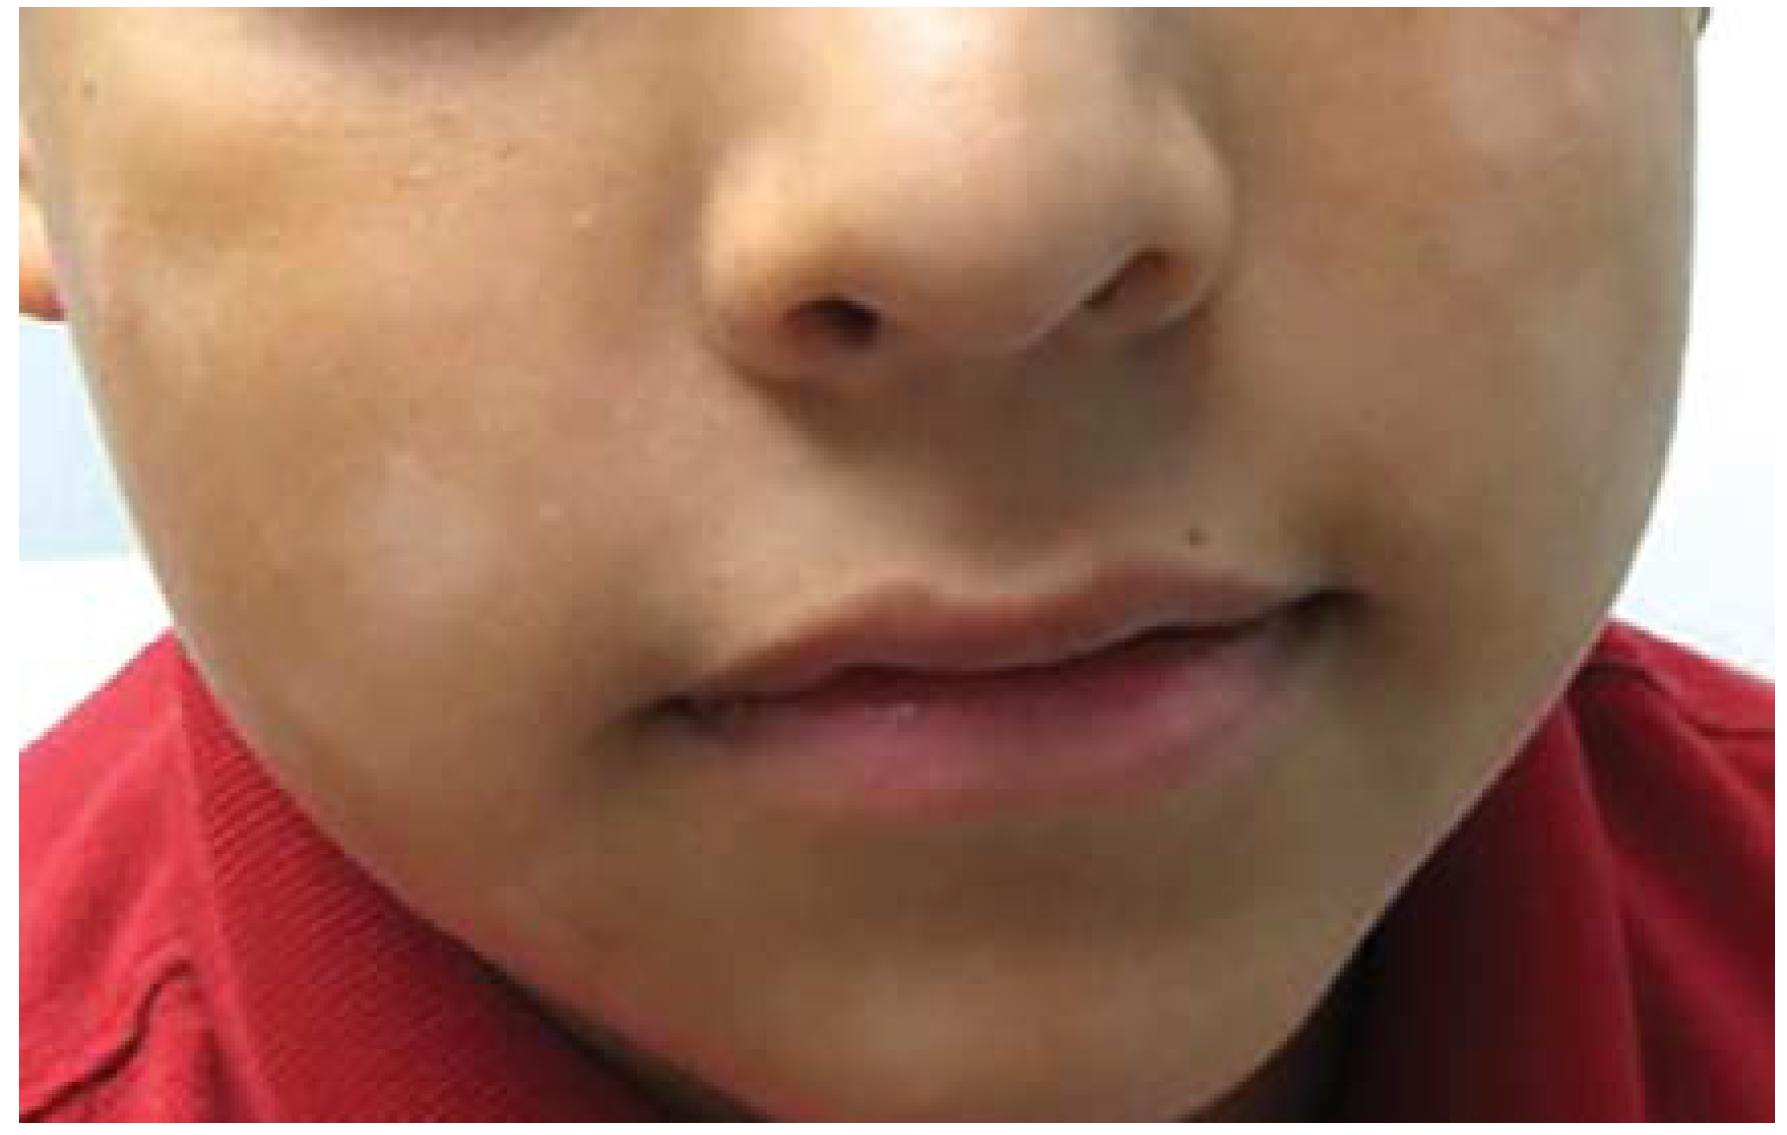 JCM | Free Full-Text | Diagnosis of Atopic Dermatitis